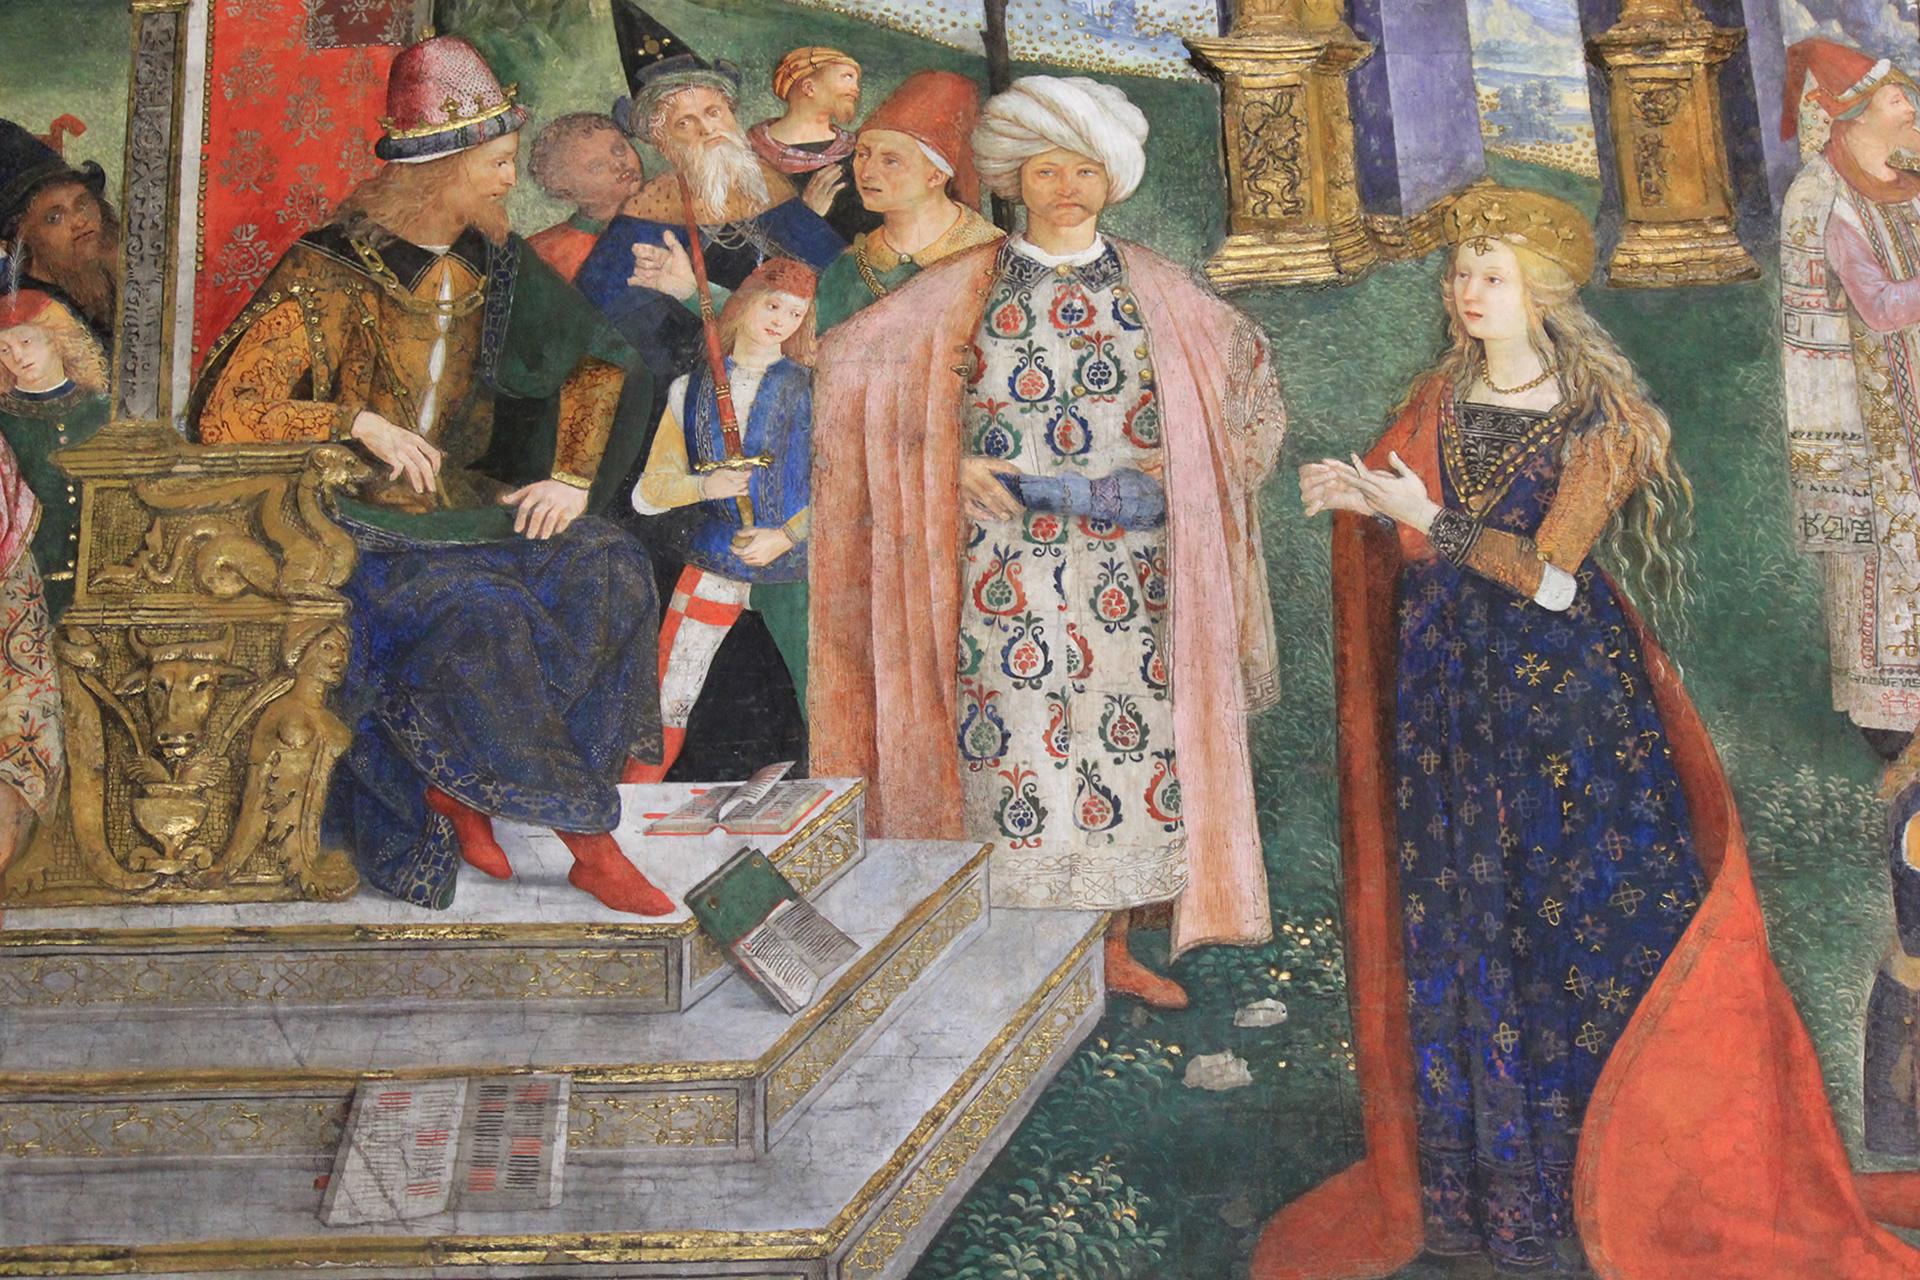 St Catherine's Disputation